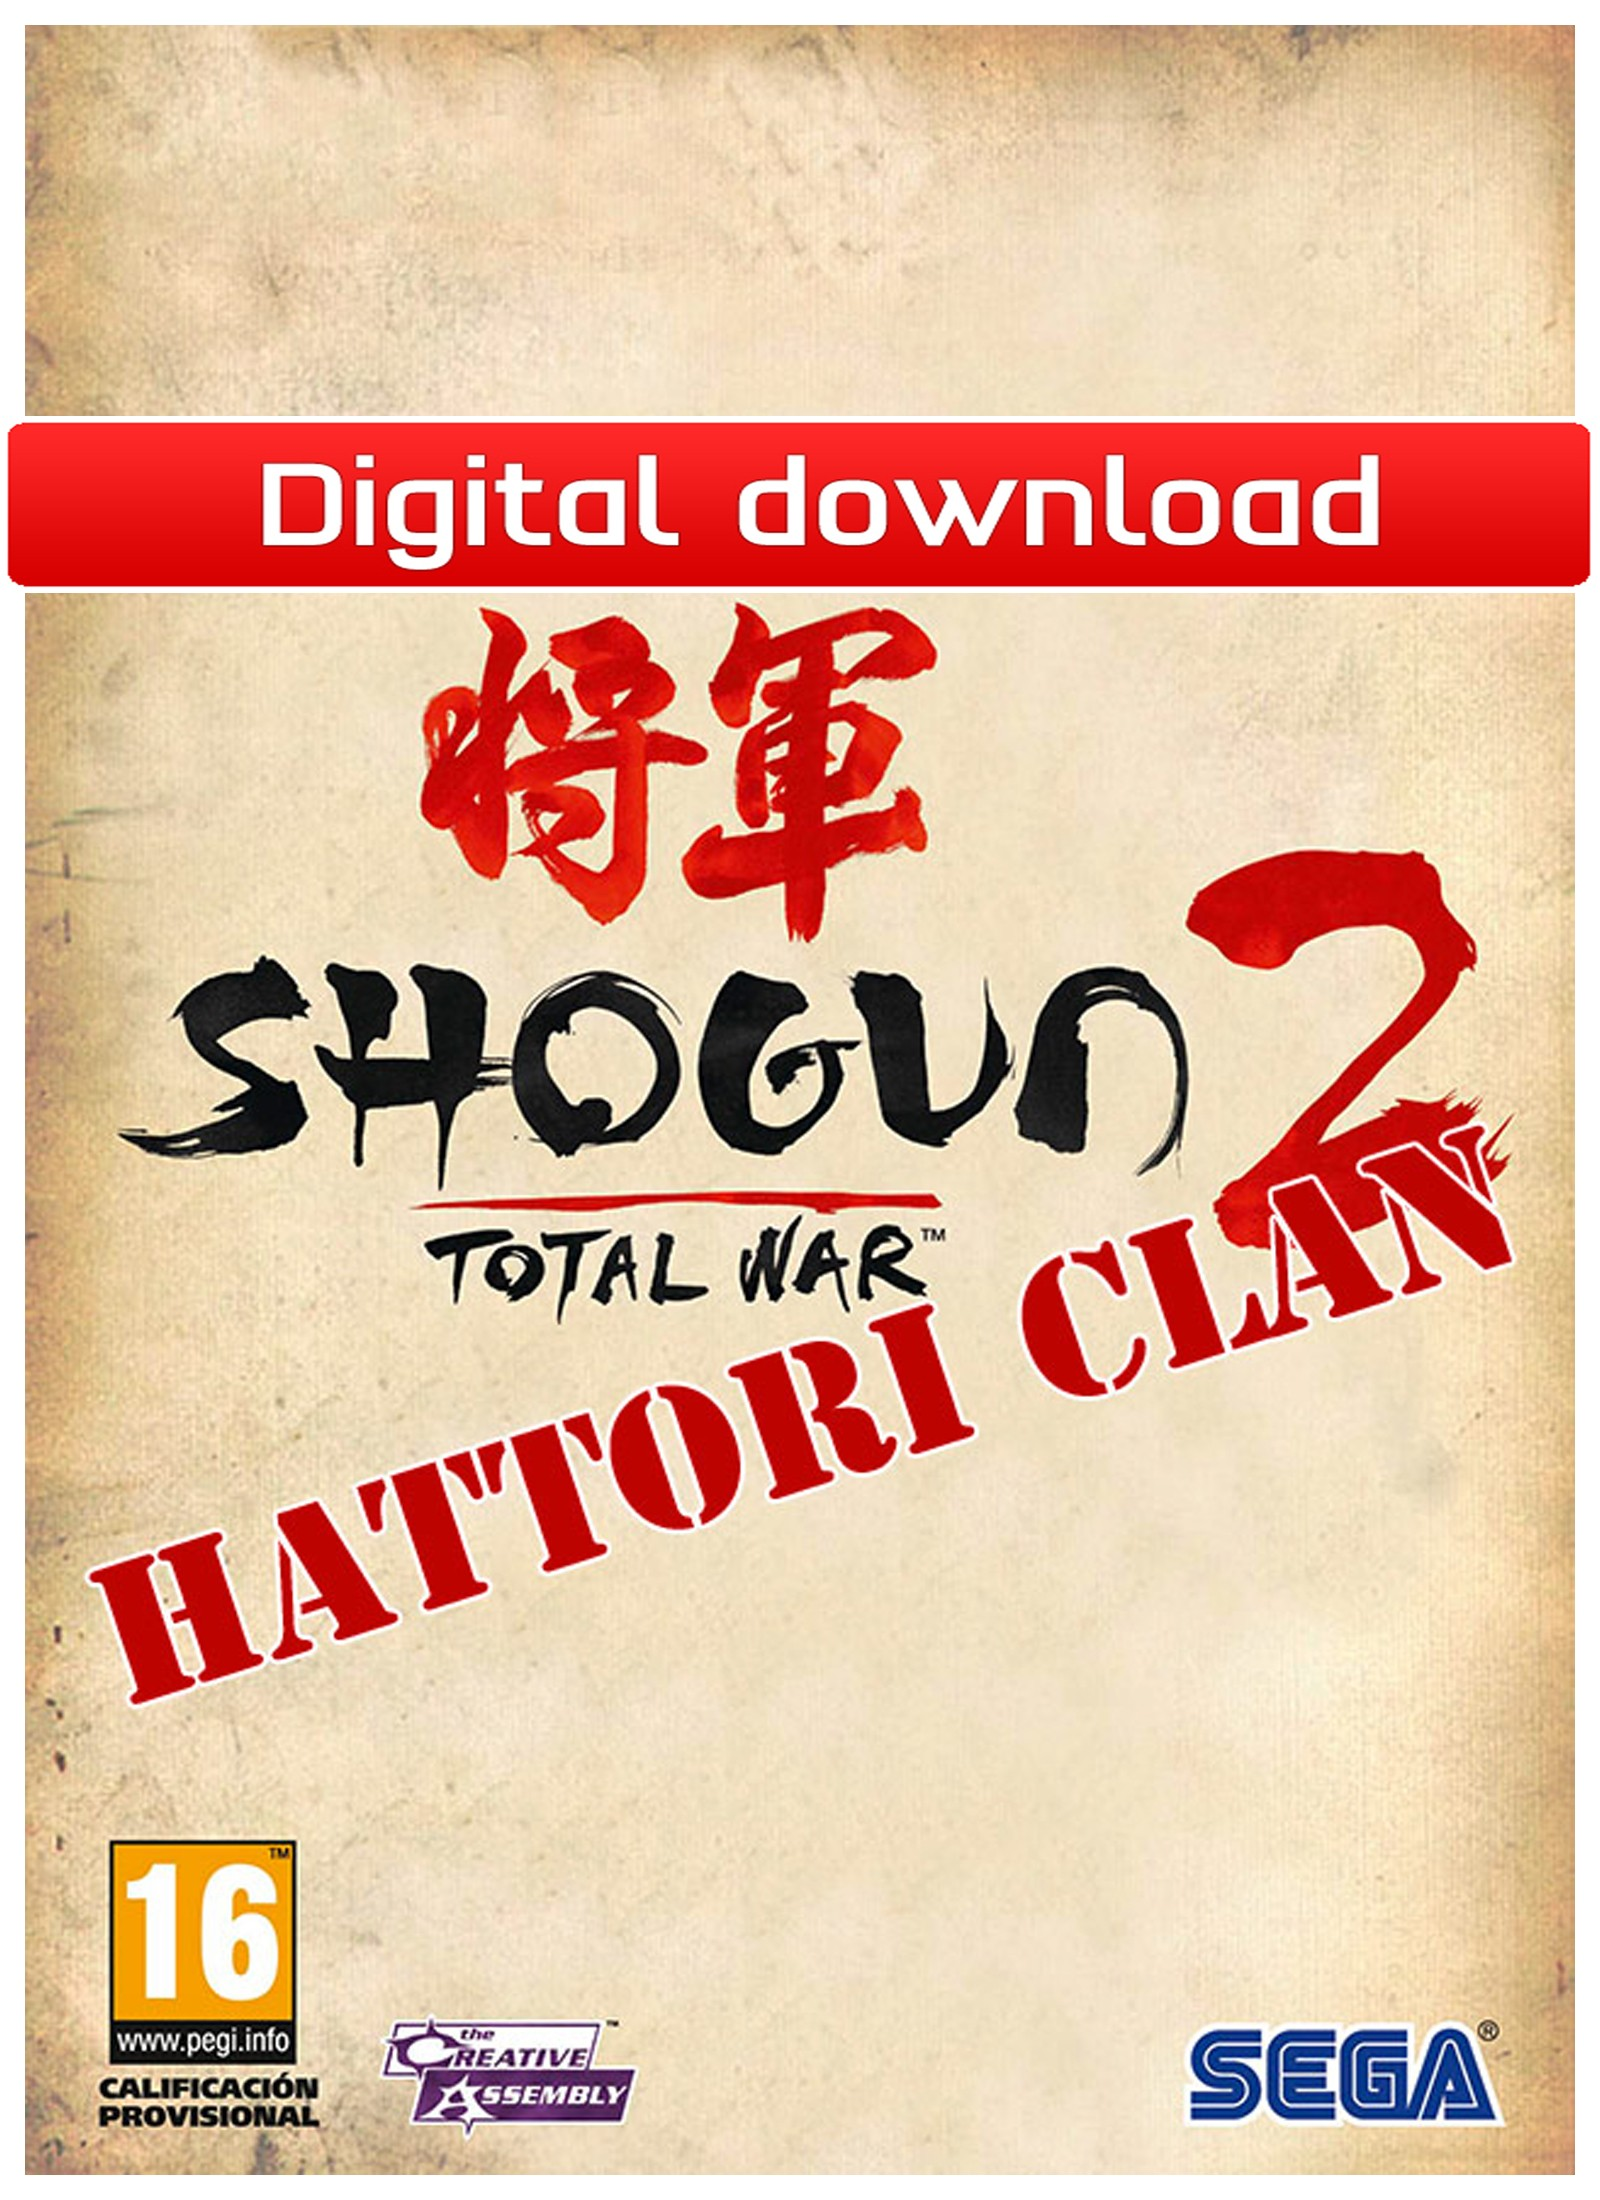 28210 : Total War: Shogun 2: Hattori Clan Pack (PC nedlastning)